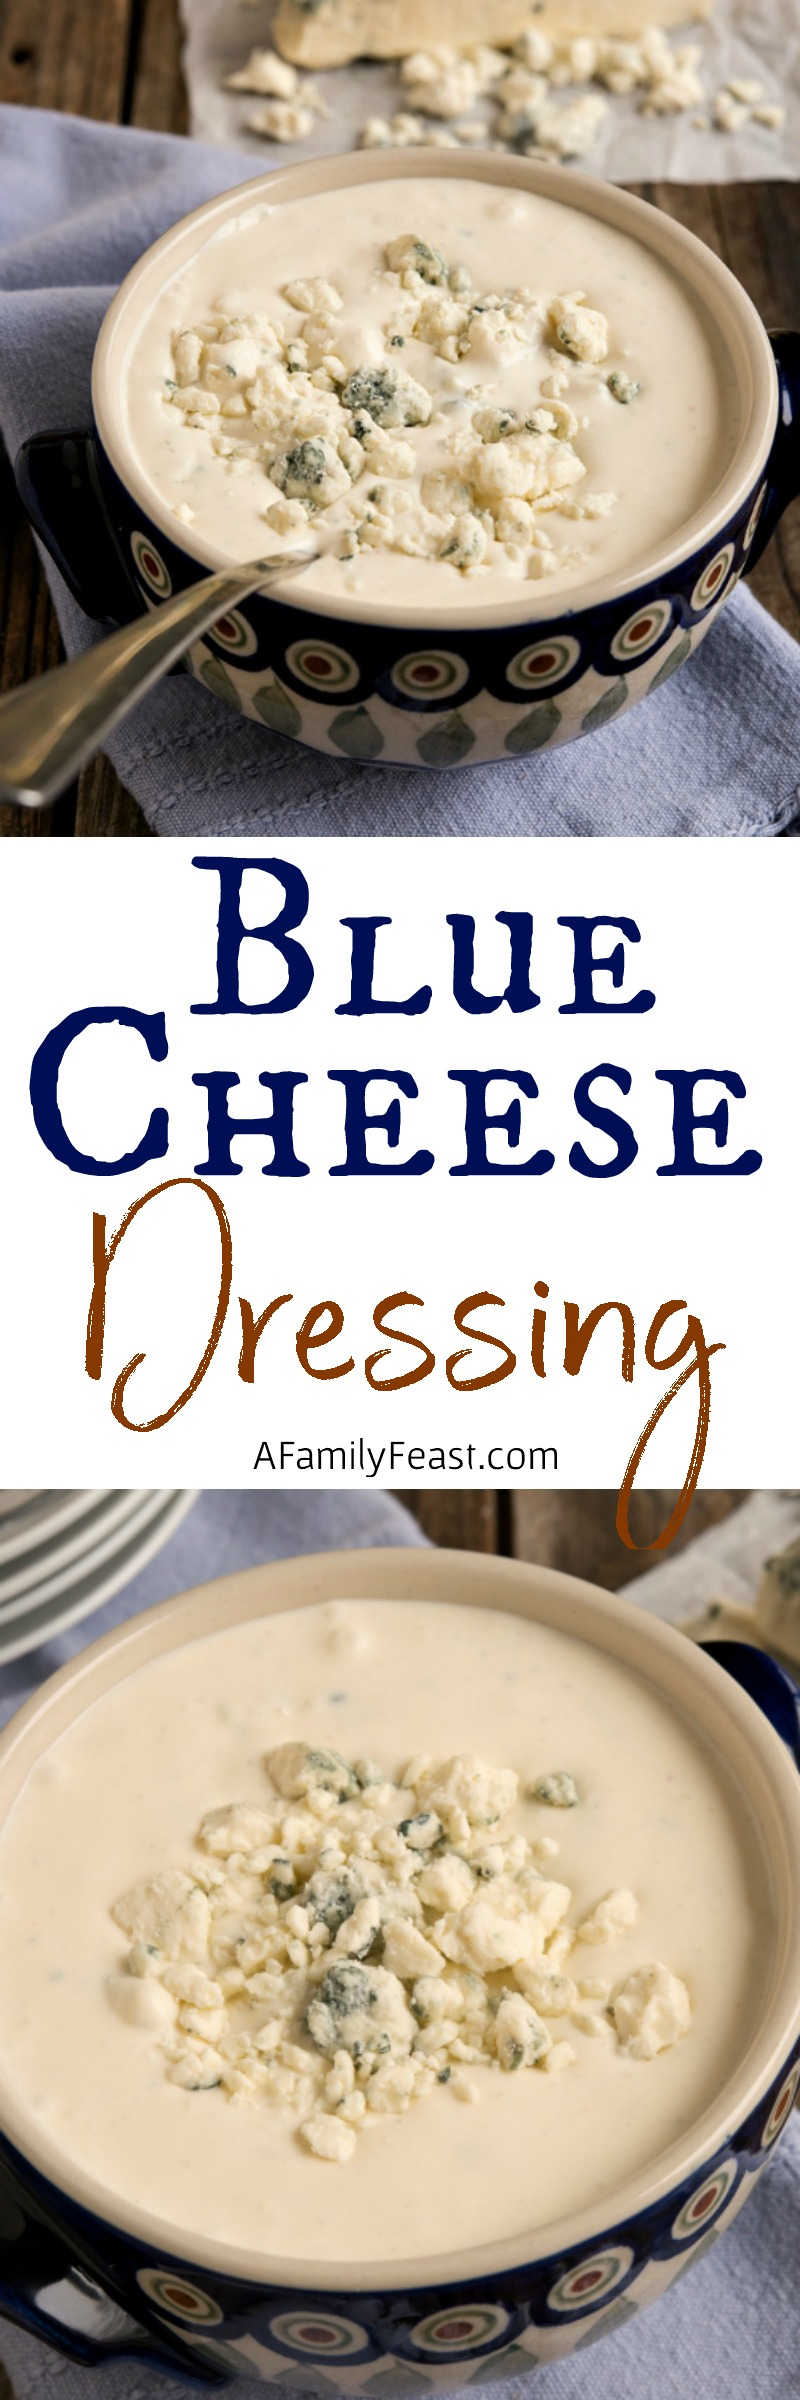 Homemade Blue Cheese Dressing